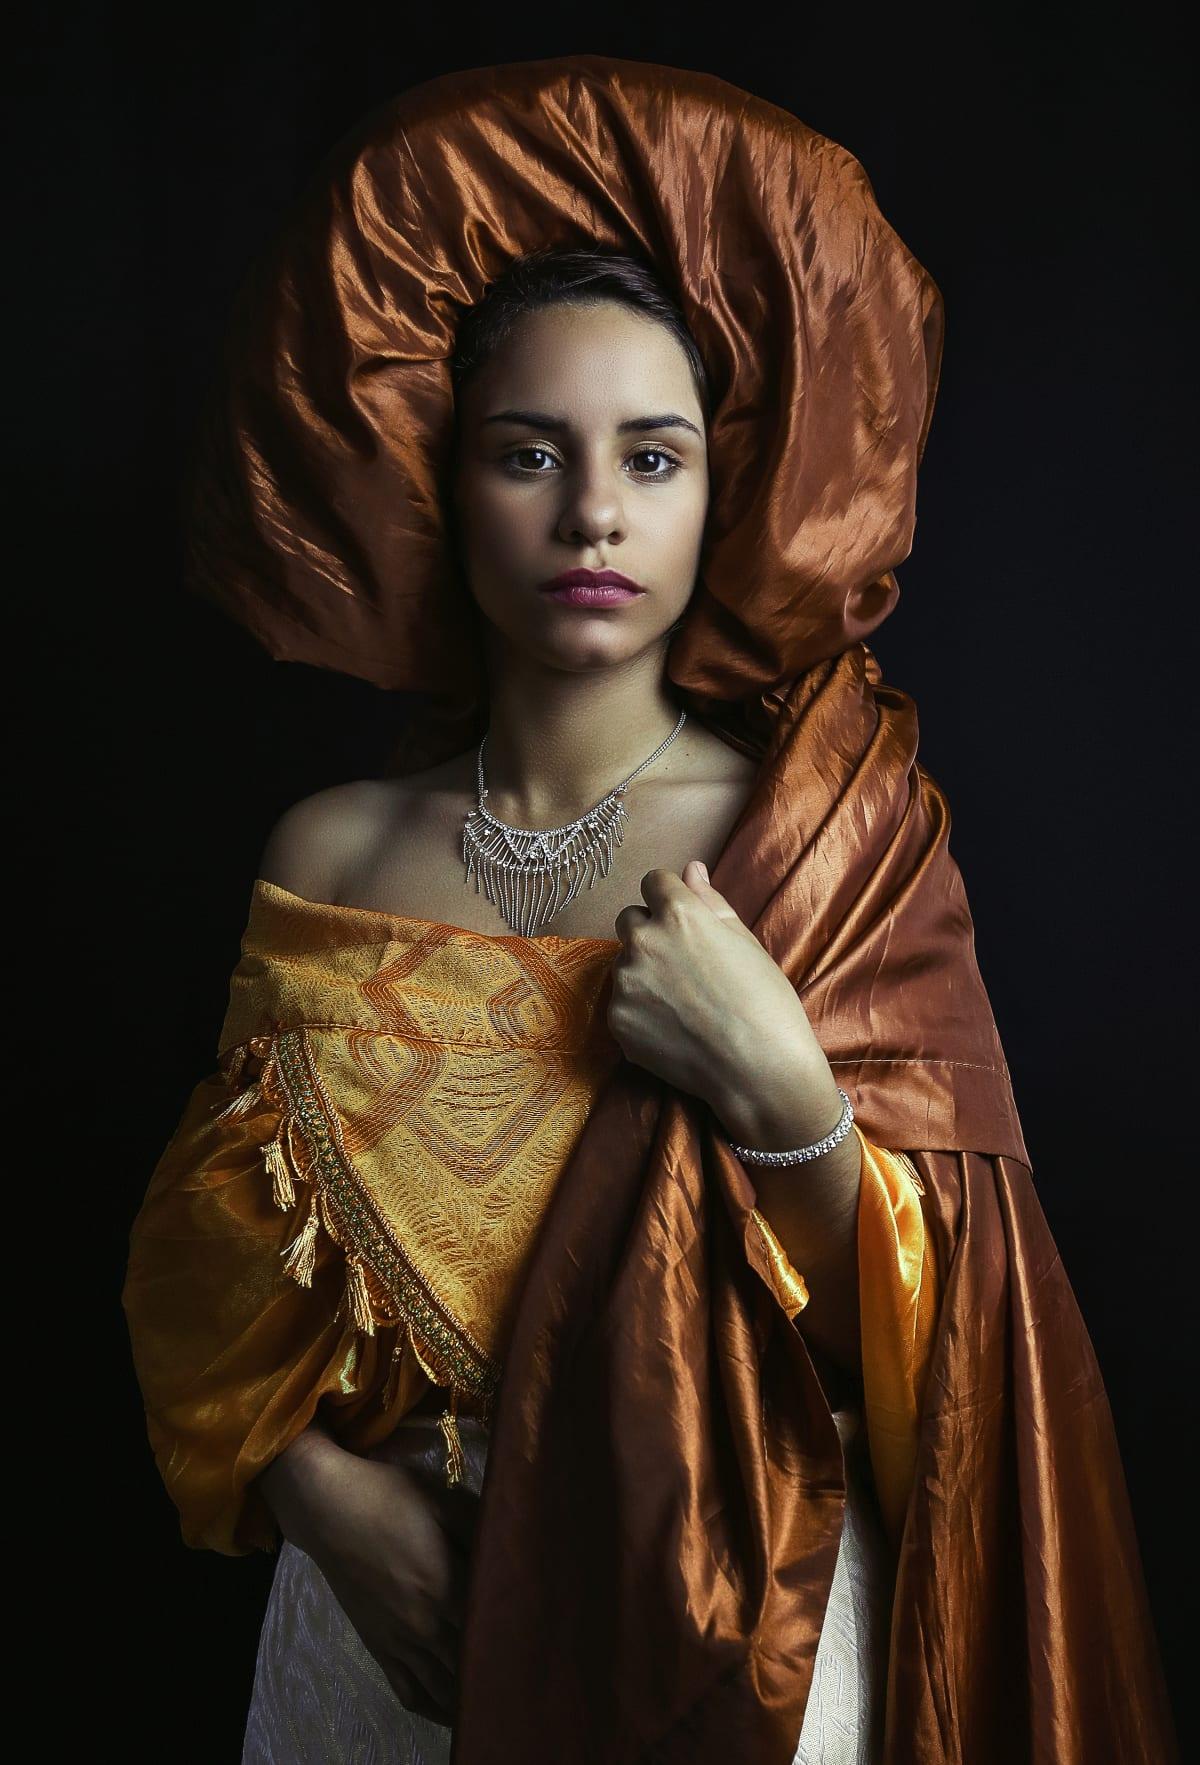 Carlos Gamez de Francisco, Portrait of a Lady, 2018